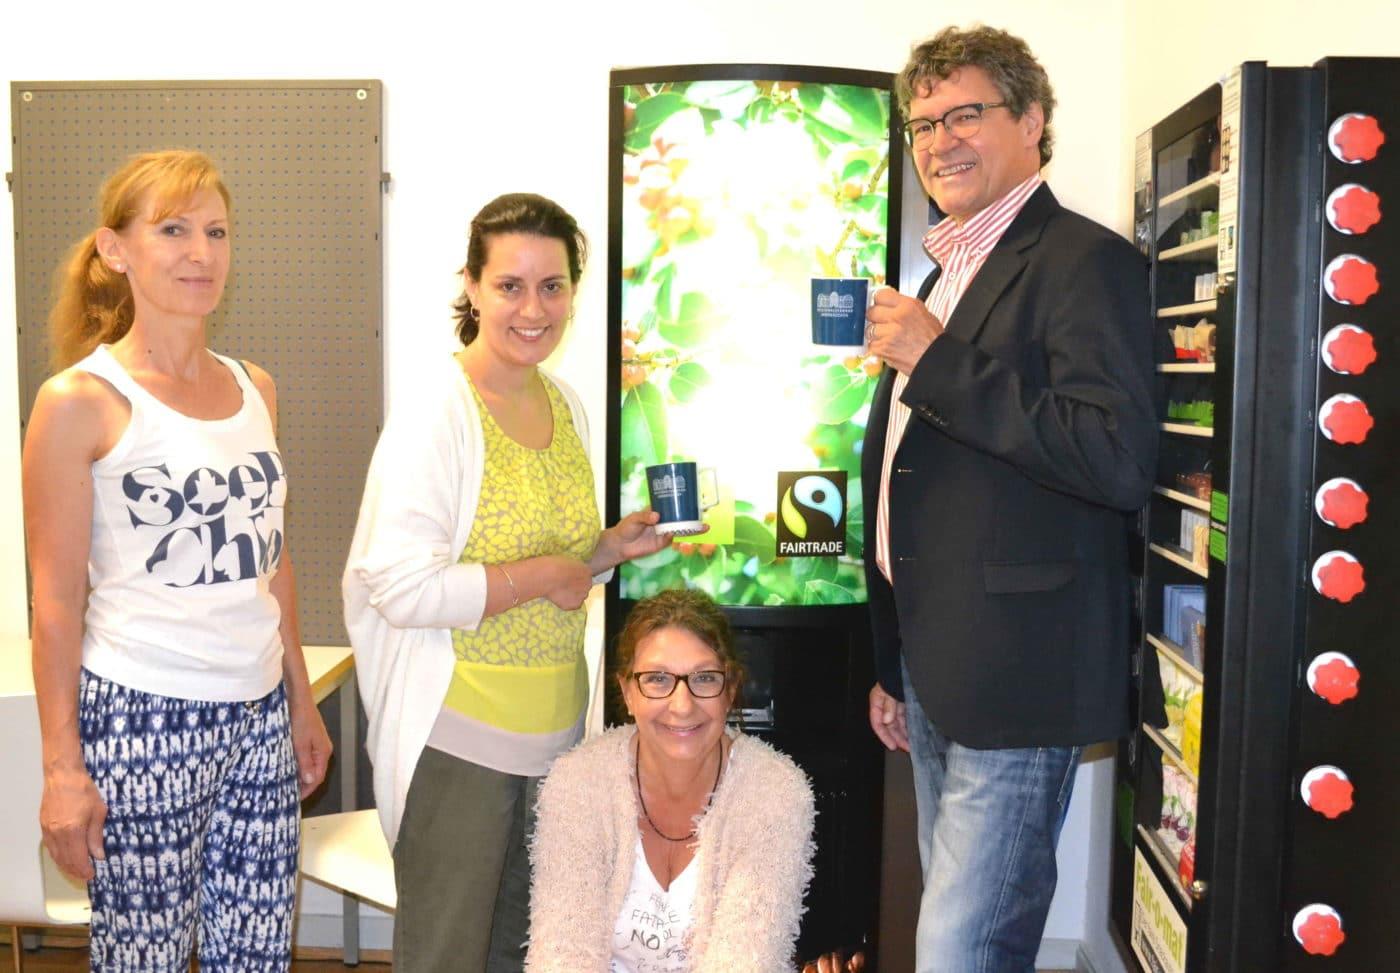 Drei faire Kaffeeautomaten in Regionalverbands-Gebäuden